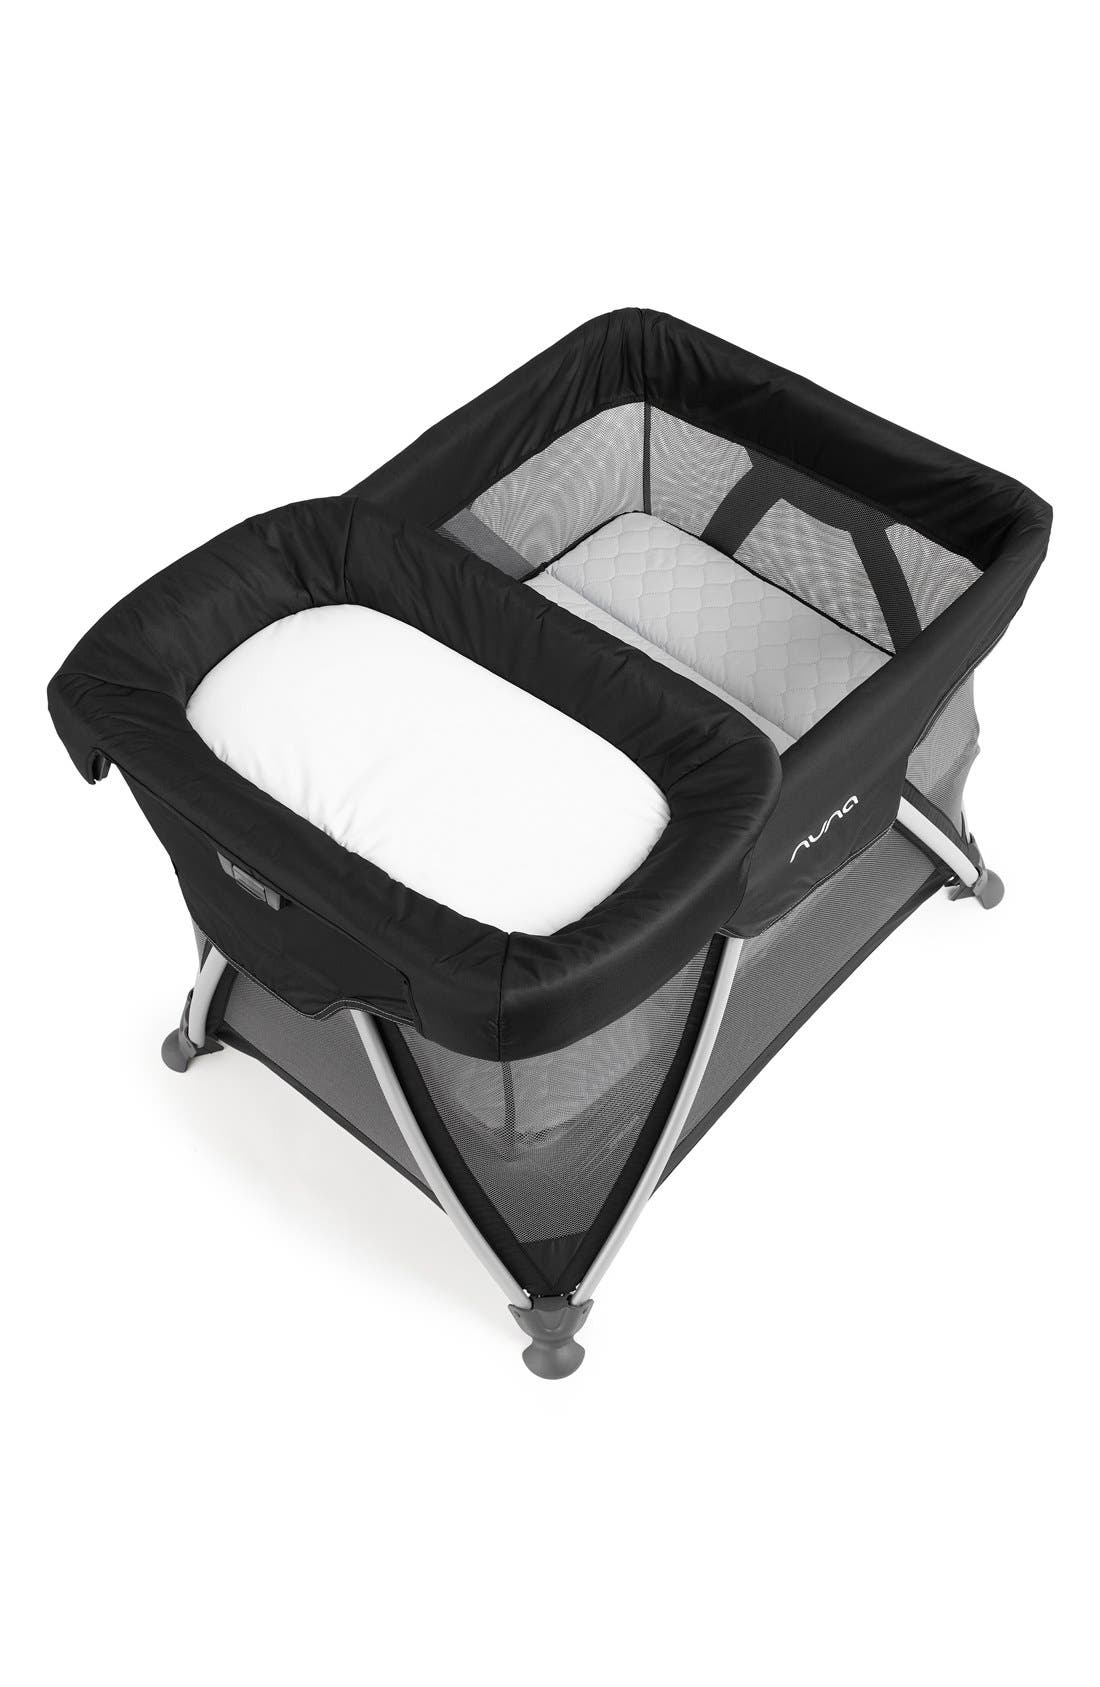 Nuna Baby Gear & Essentials: Strollers, Diaper Bags & Toys | Nordstrom